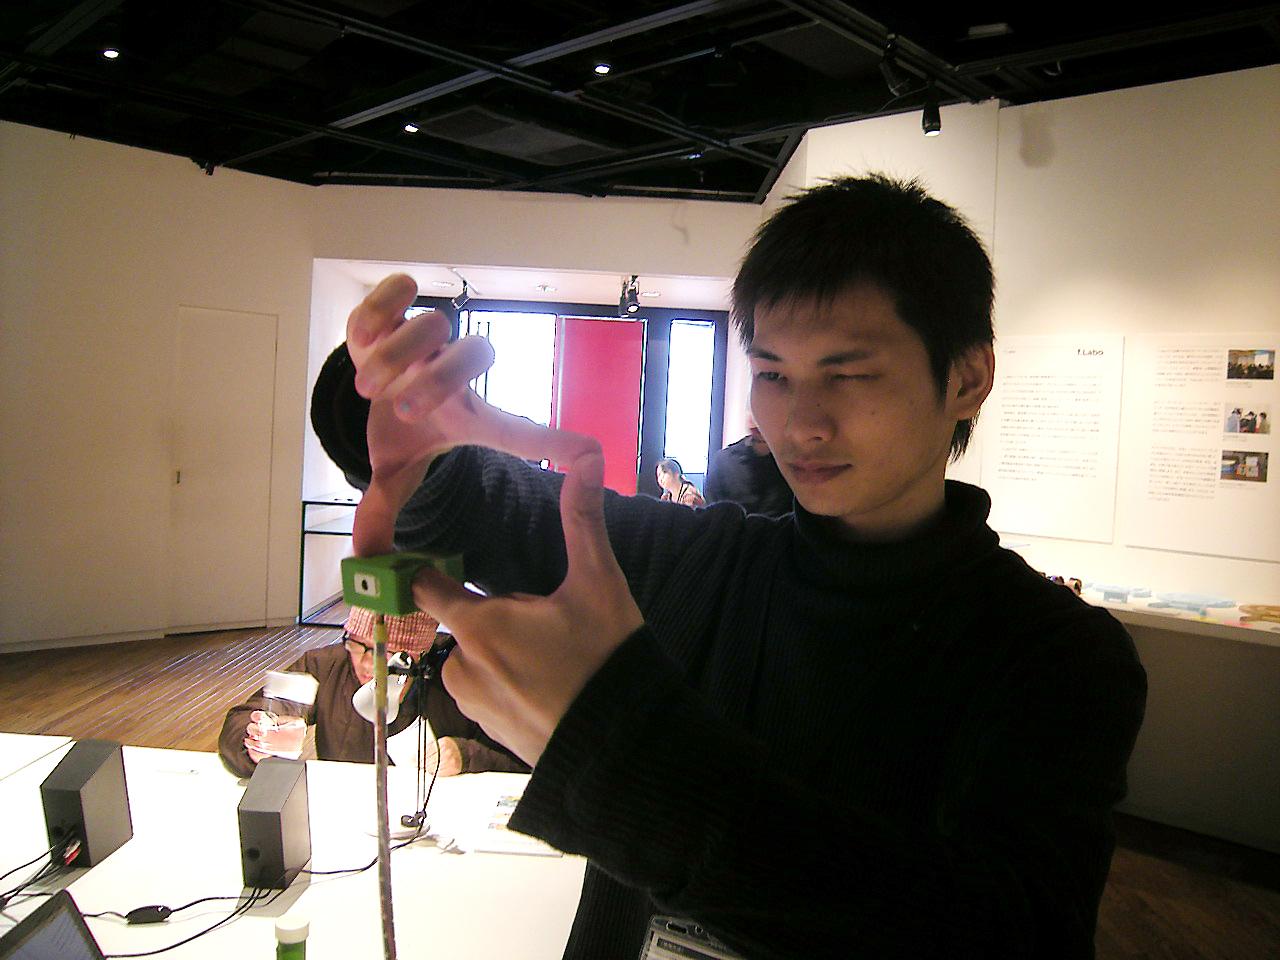 Ubi-Camera 作者:川端博理/古山善将